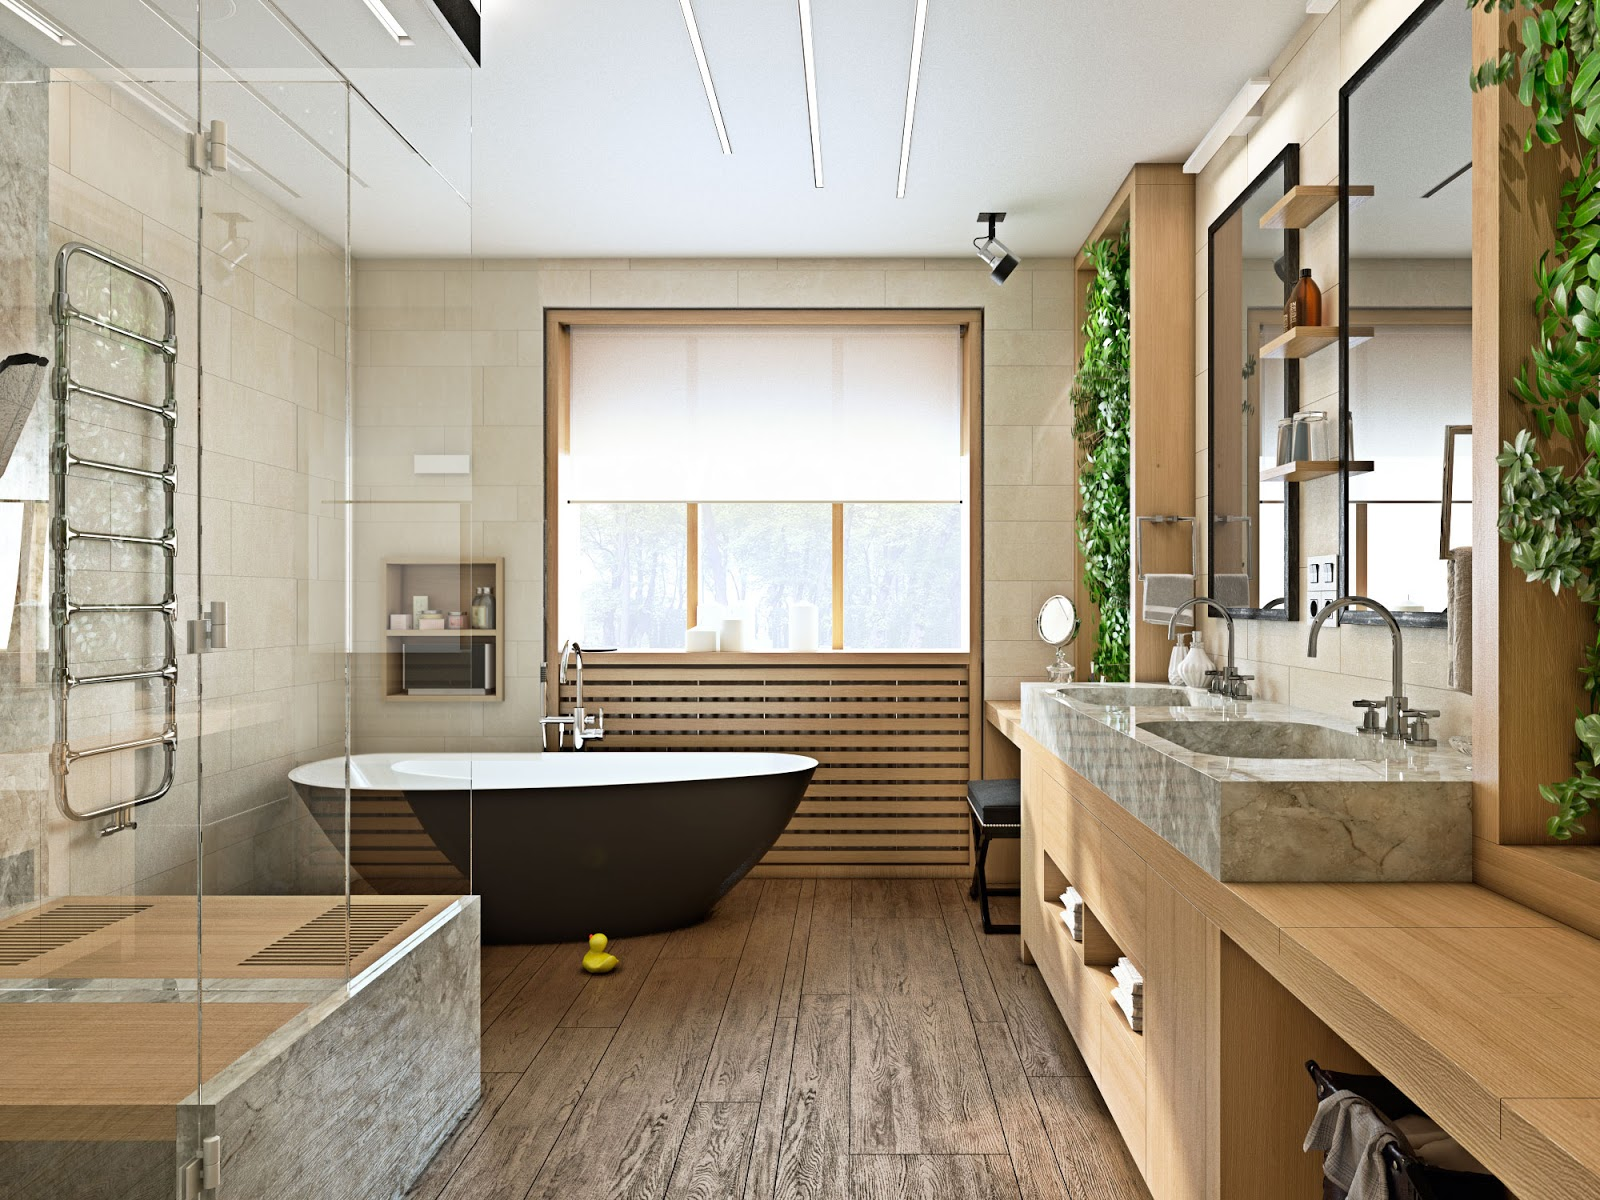 Ванная комната с живыми растениями в эко-стиле